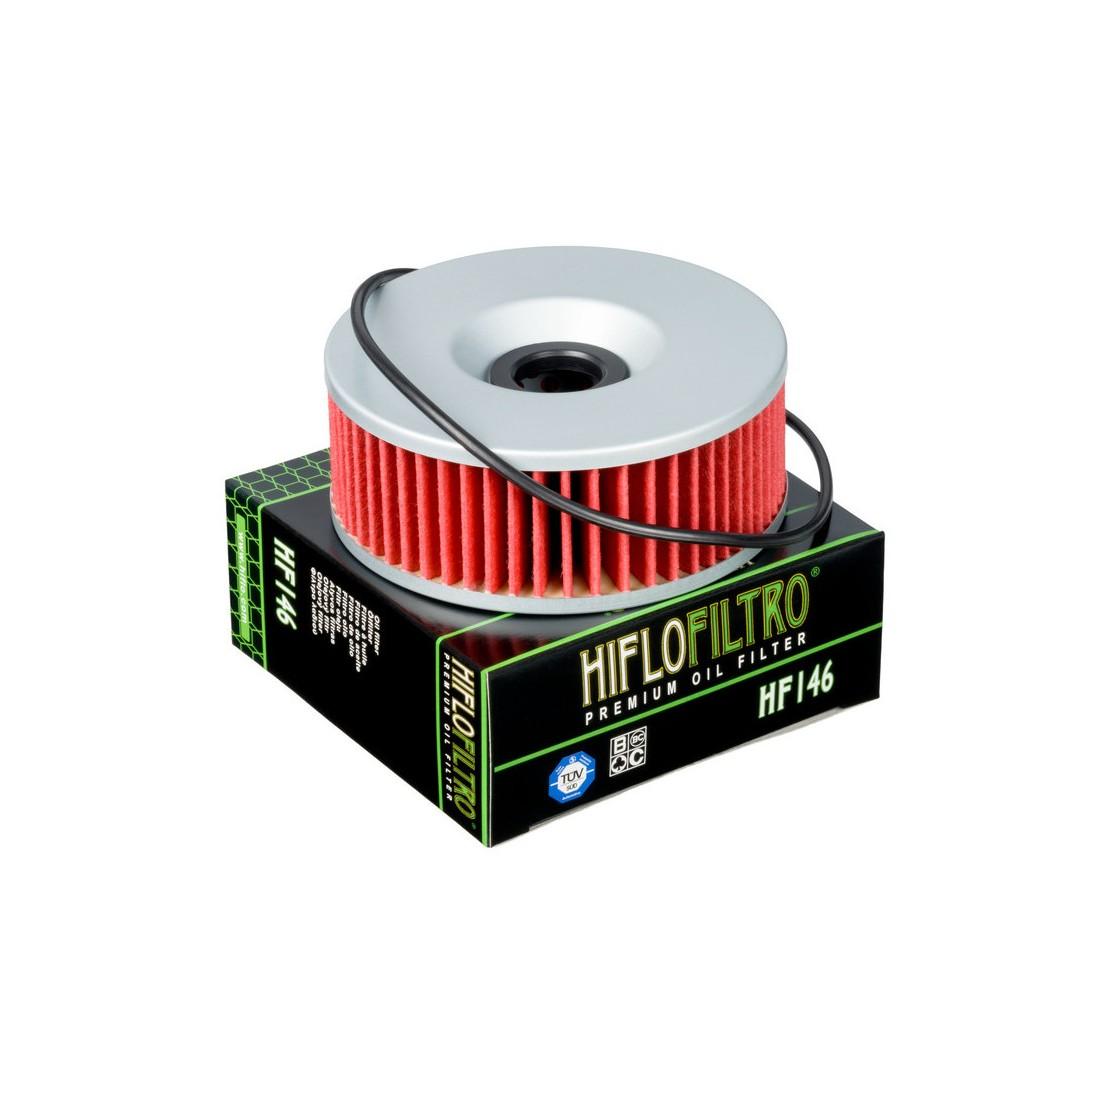 Filtro Aceite Hiflofiltro HF146